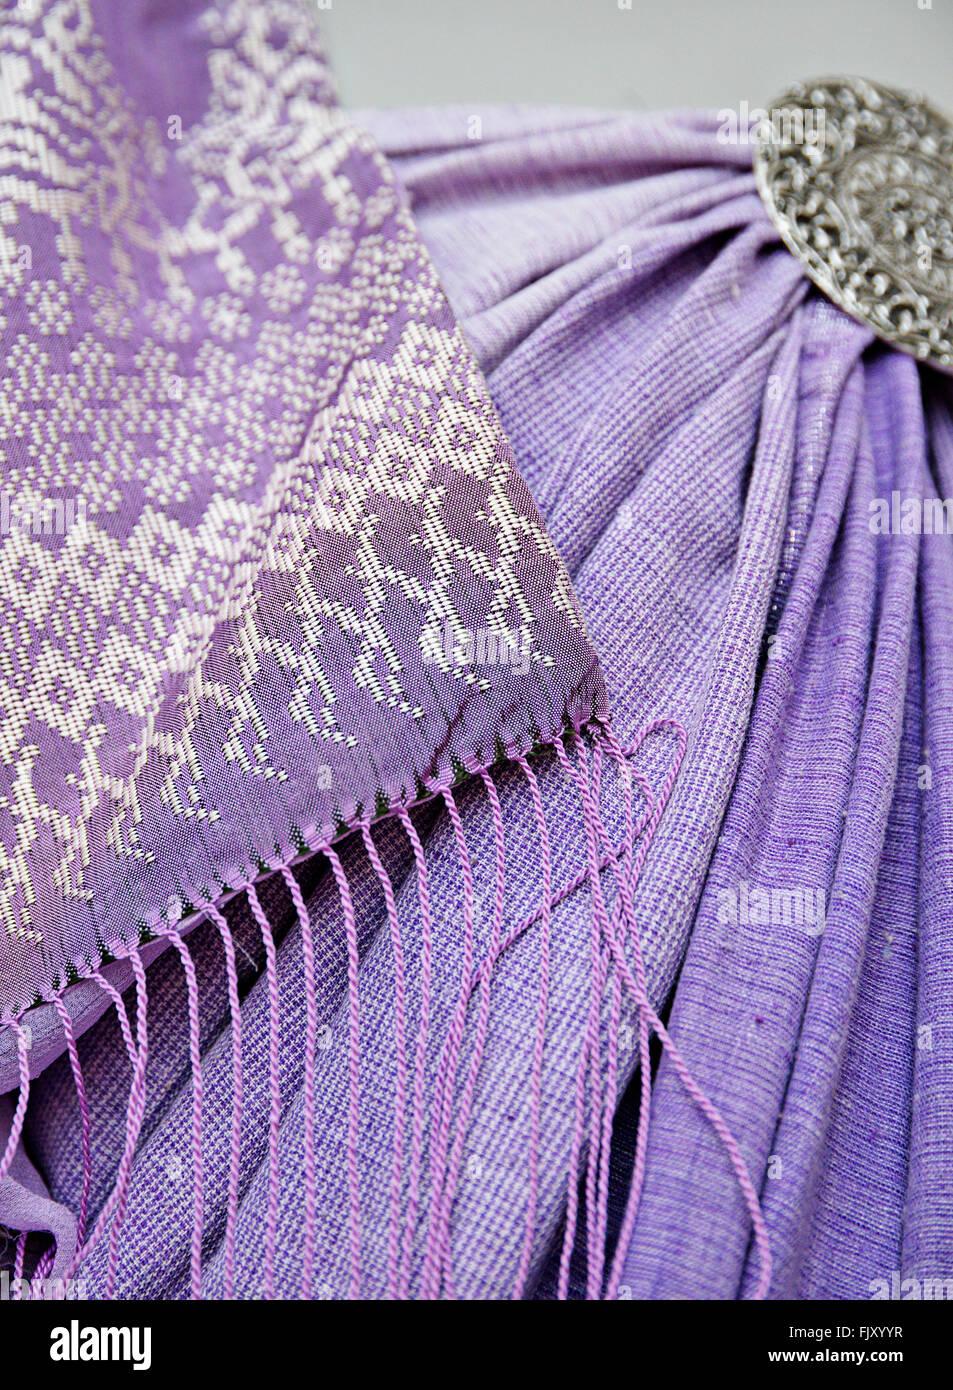 Artigianato tradizionale (songket, un clebrational sarong) in Terengganu, Malaysia. Immagini Stock